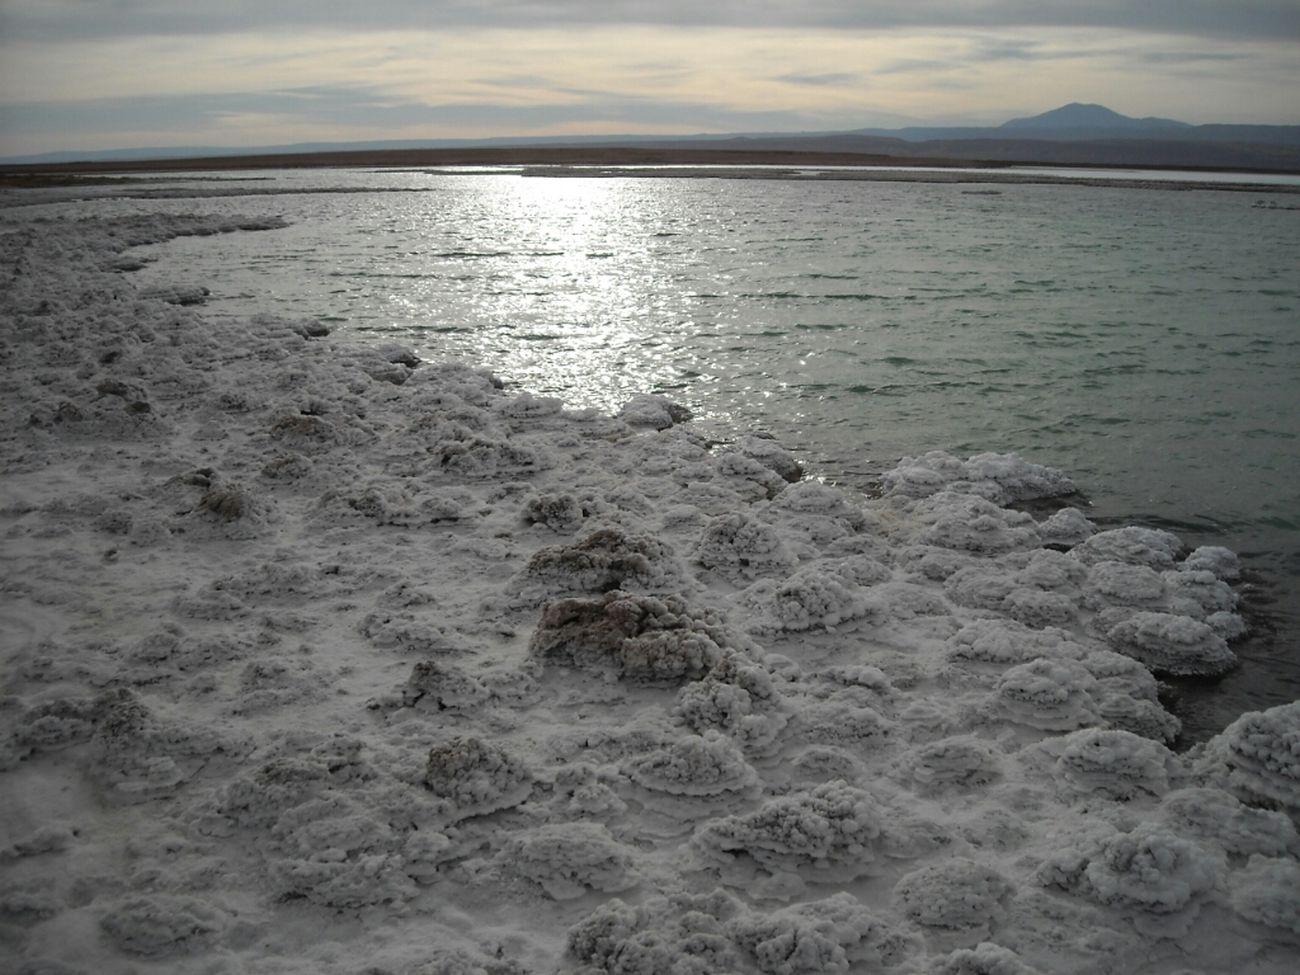 Atacama's desert, Chile Landscape Enjoying The View TheMinimals (less Edit Juxt Photography) #sunset #sun #clouds #skylovers #sky #nature #beautifulinnature #naturalbeauty #photography #landscape Nature